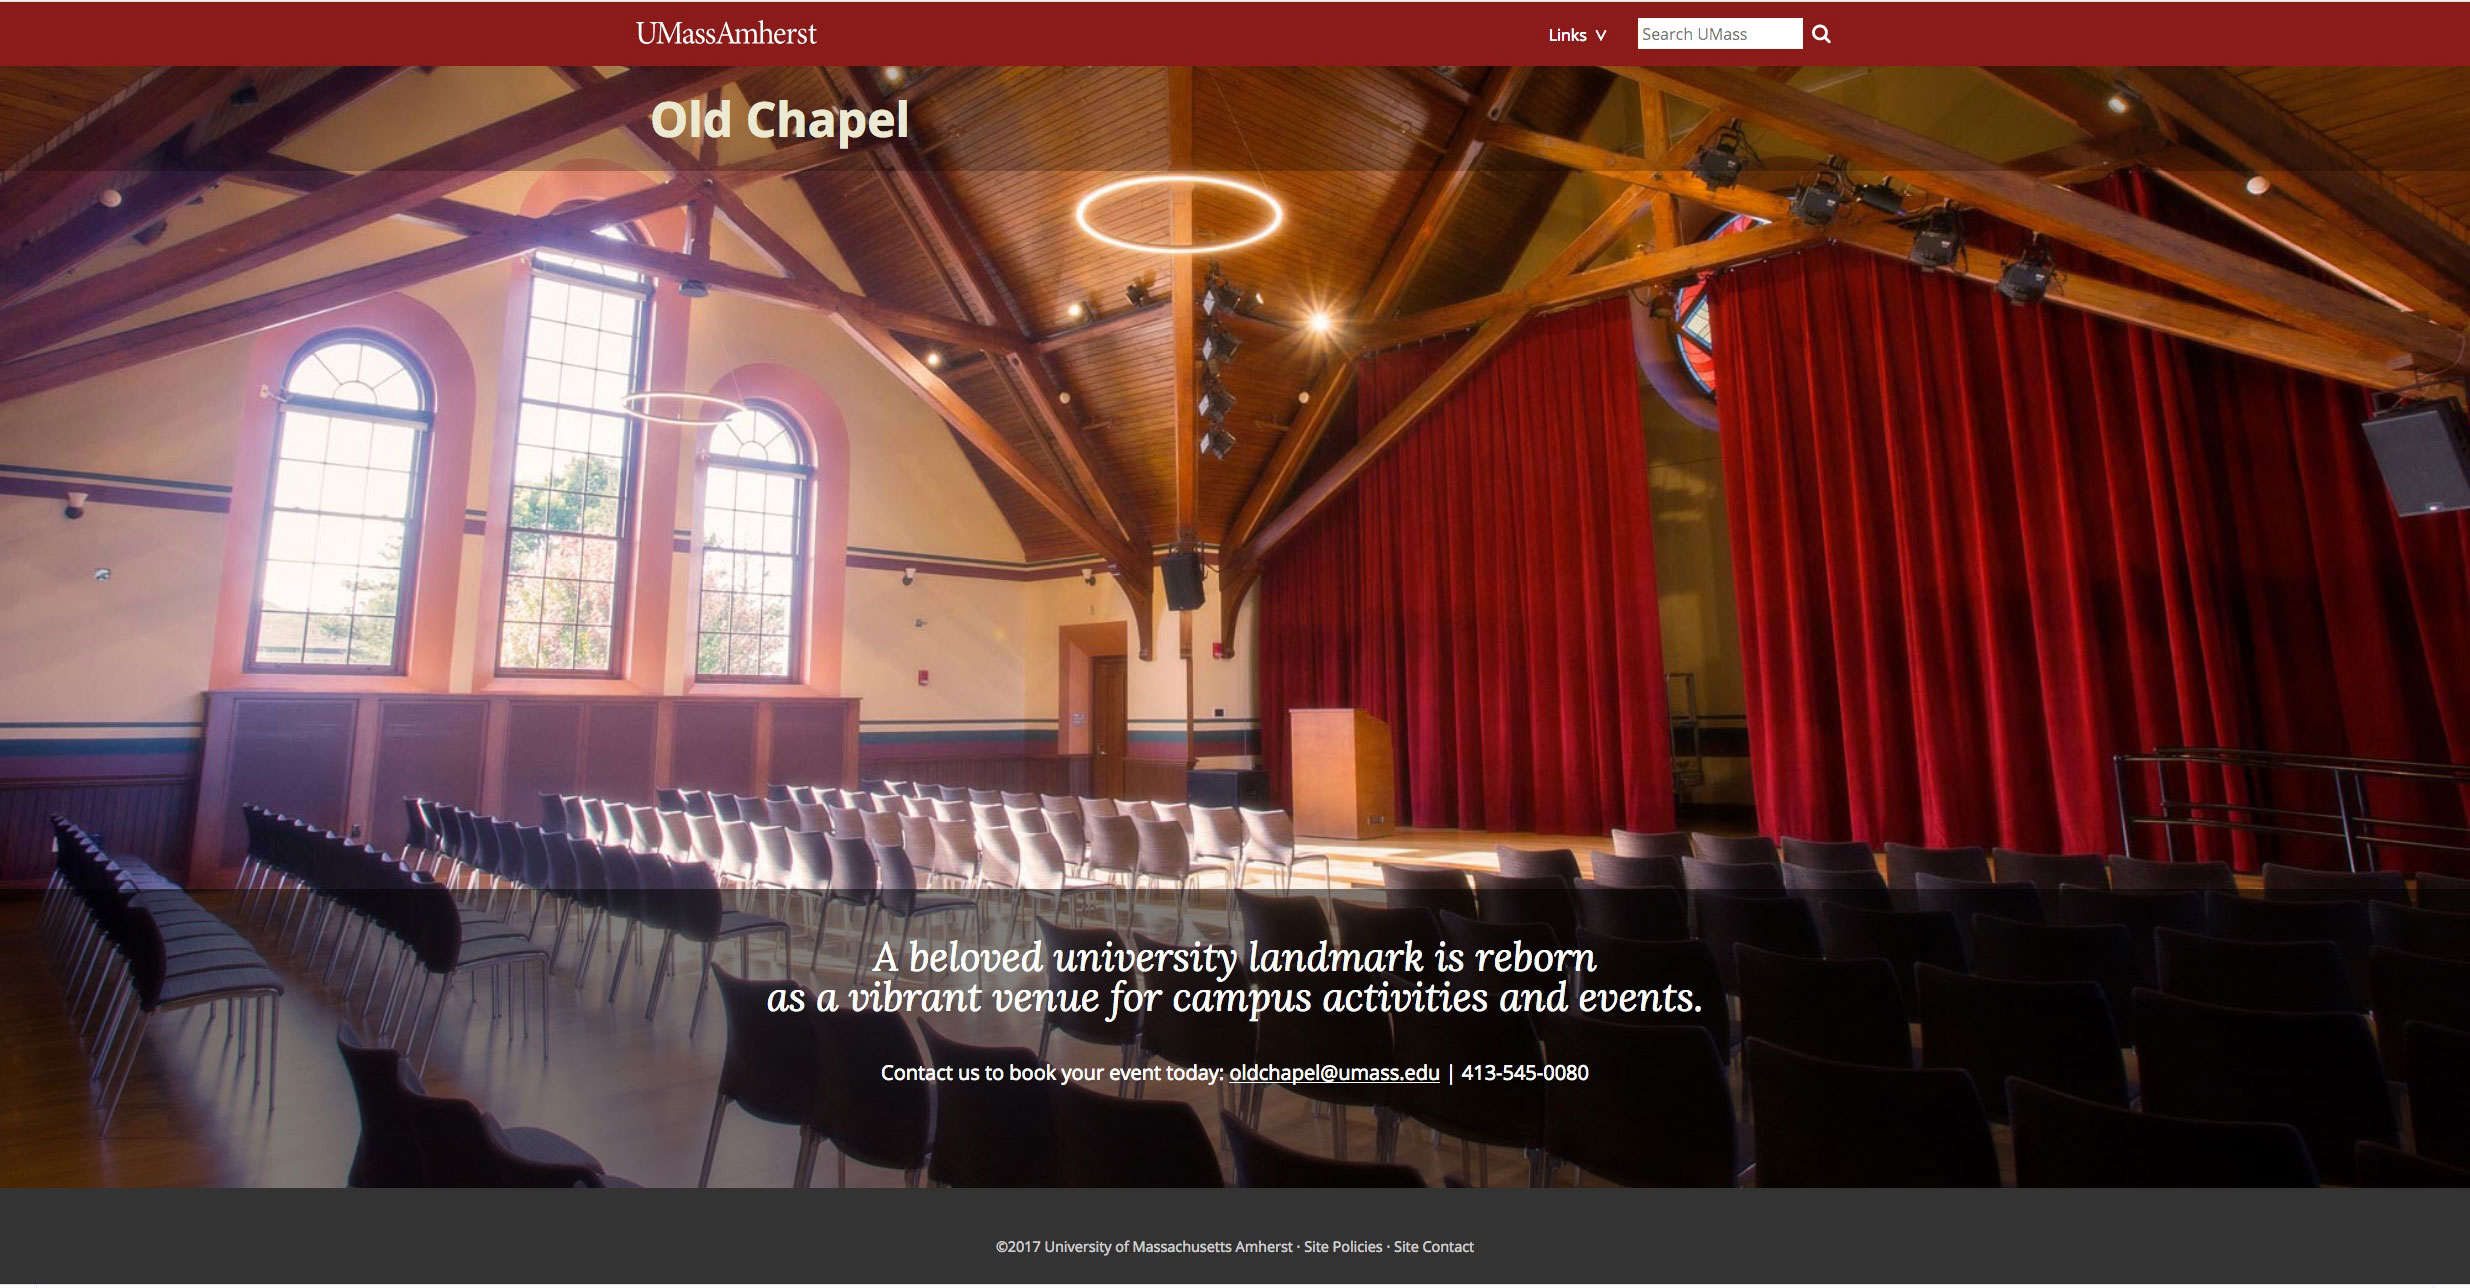 Old Chapel - UMass, Amherst